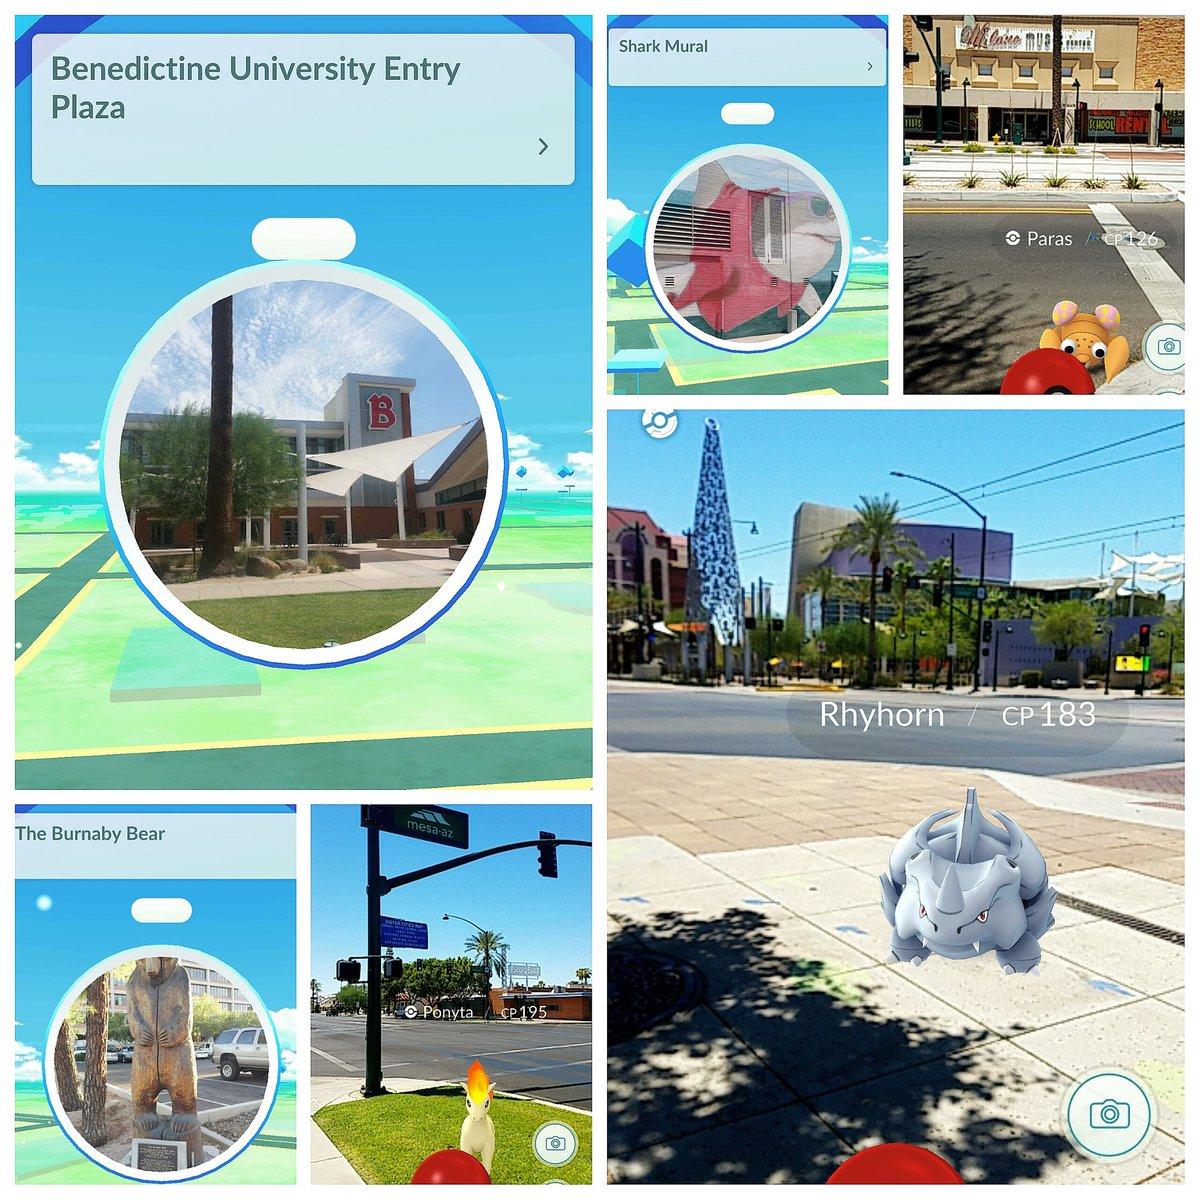 #MesaAZ is full of @Pokemon & #pokestop locations, especially @downtownmesa, #PokemonGO  trainers unite!